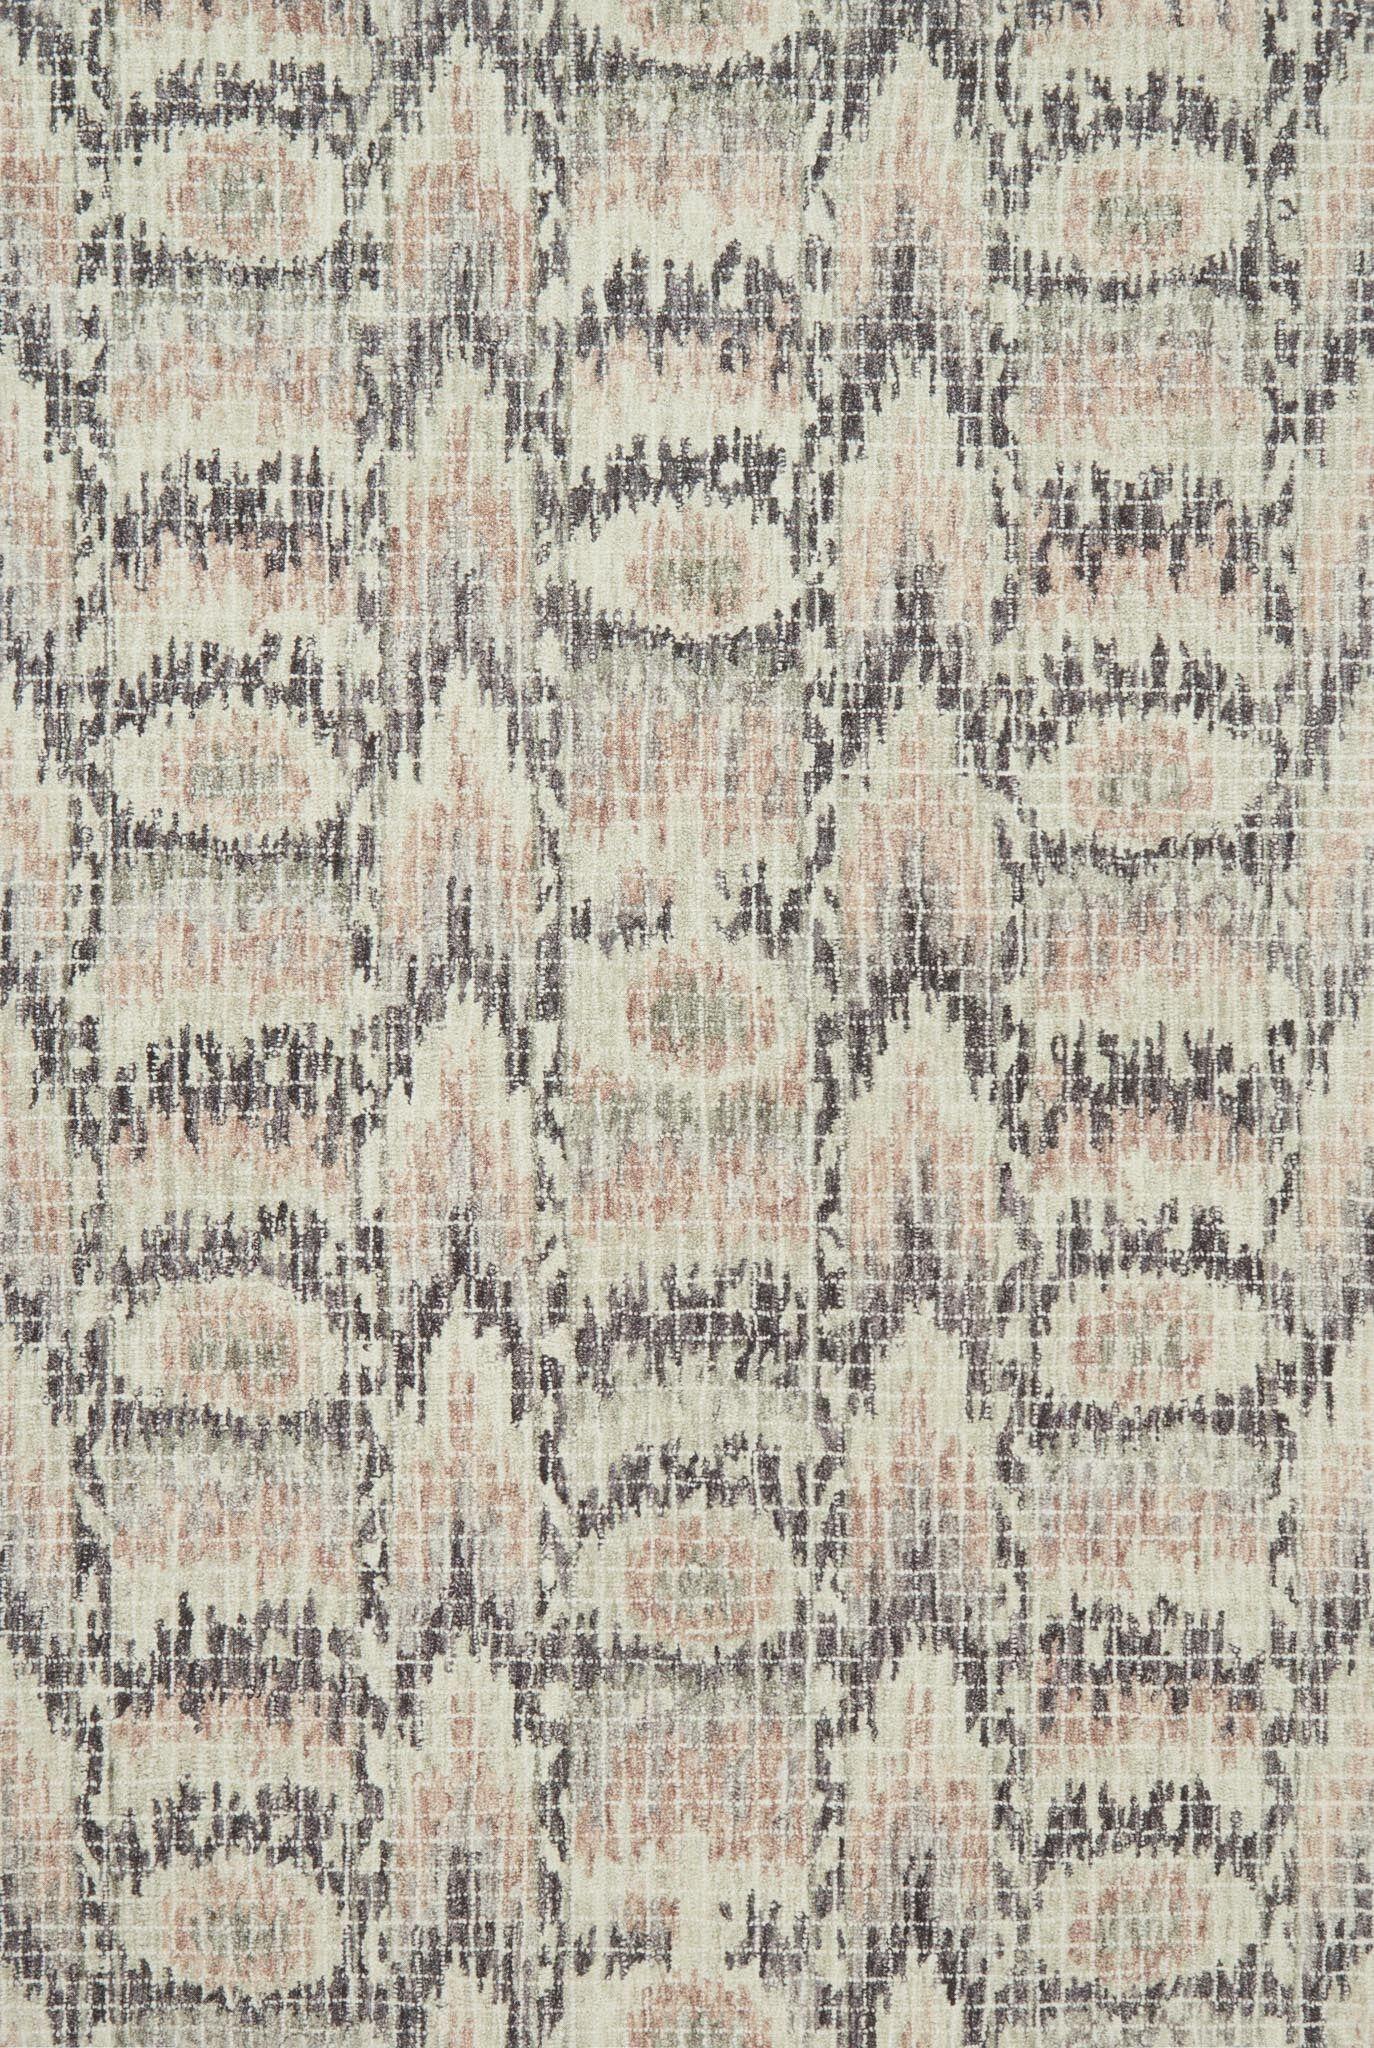 Zeinab Hand Hooked Wool Blush/Rasin Area Rug Rug Size: Rectangle 5' x 7'6